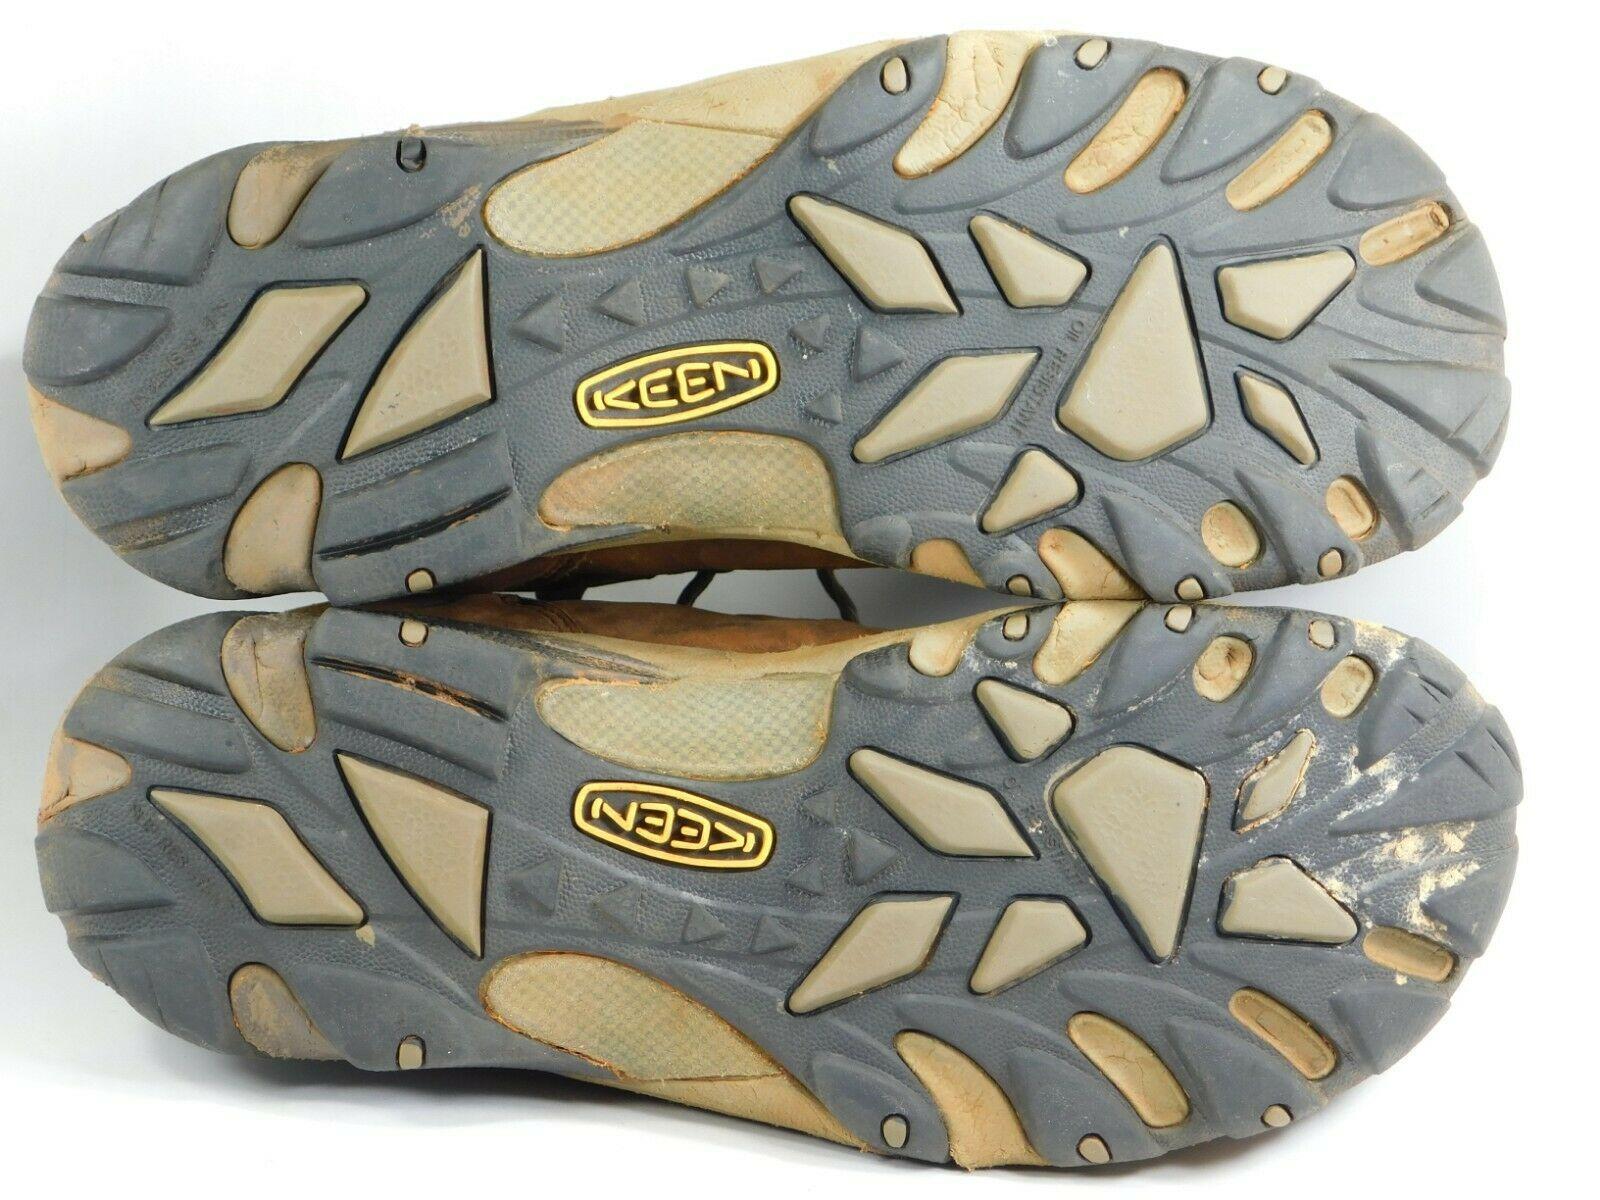 Keen Detroit Mid Top Size US 12 M (D) EU 46 Men's Steel Toe Work Boots 1007004